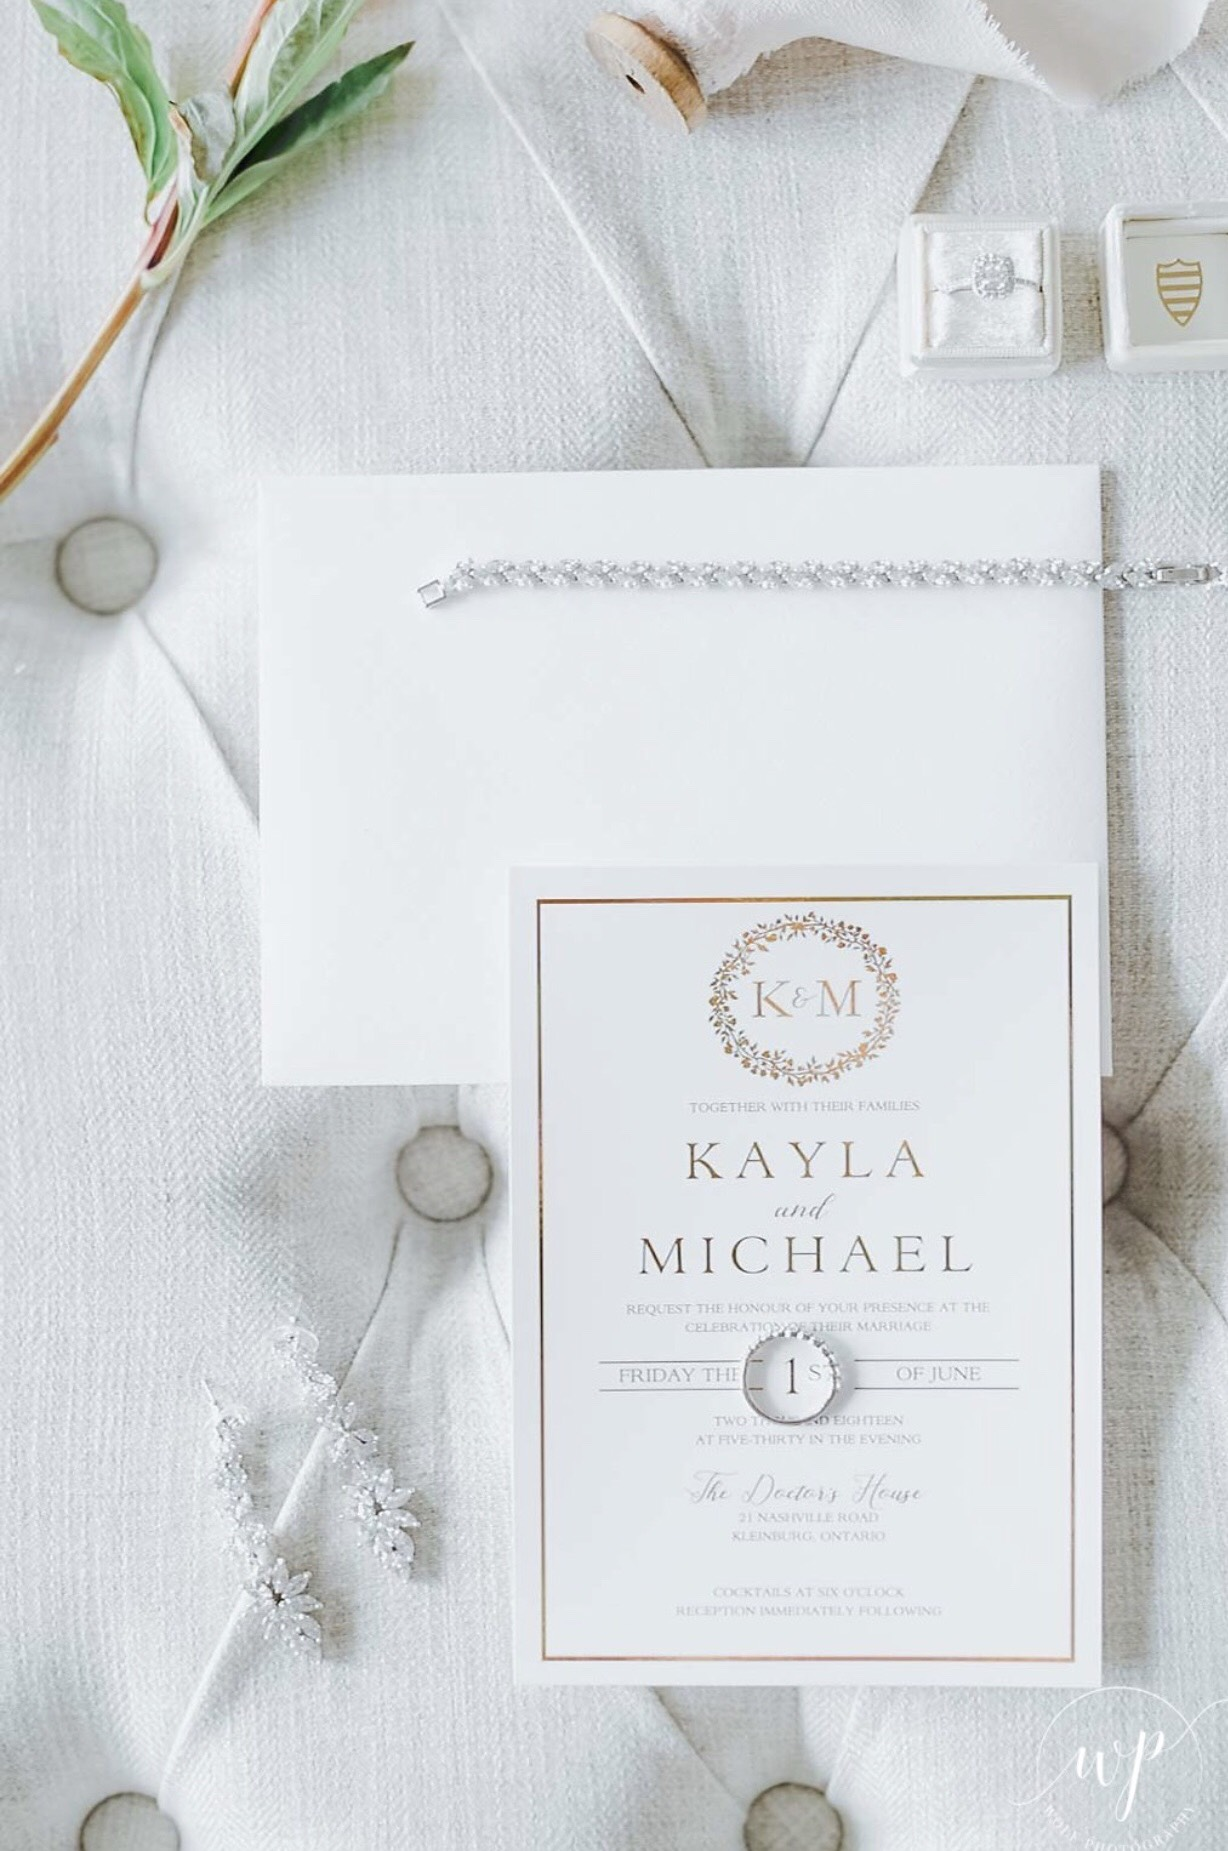 Gold foil wedding invitation flat lay on wedding day